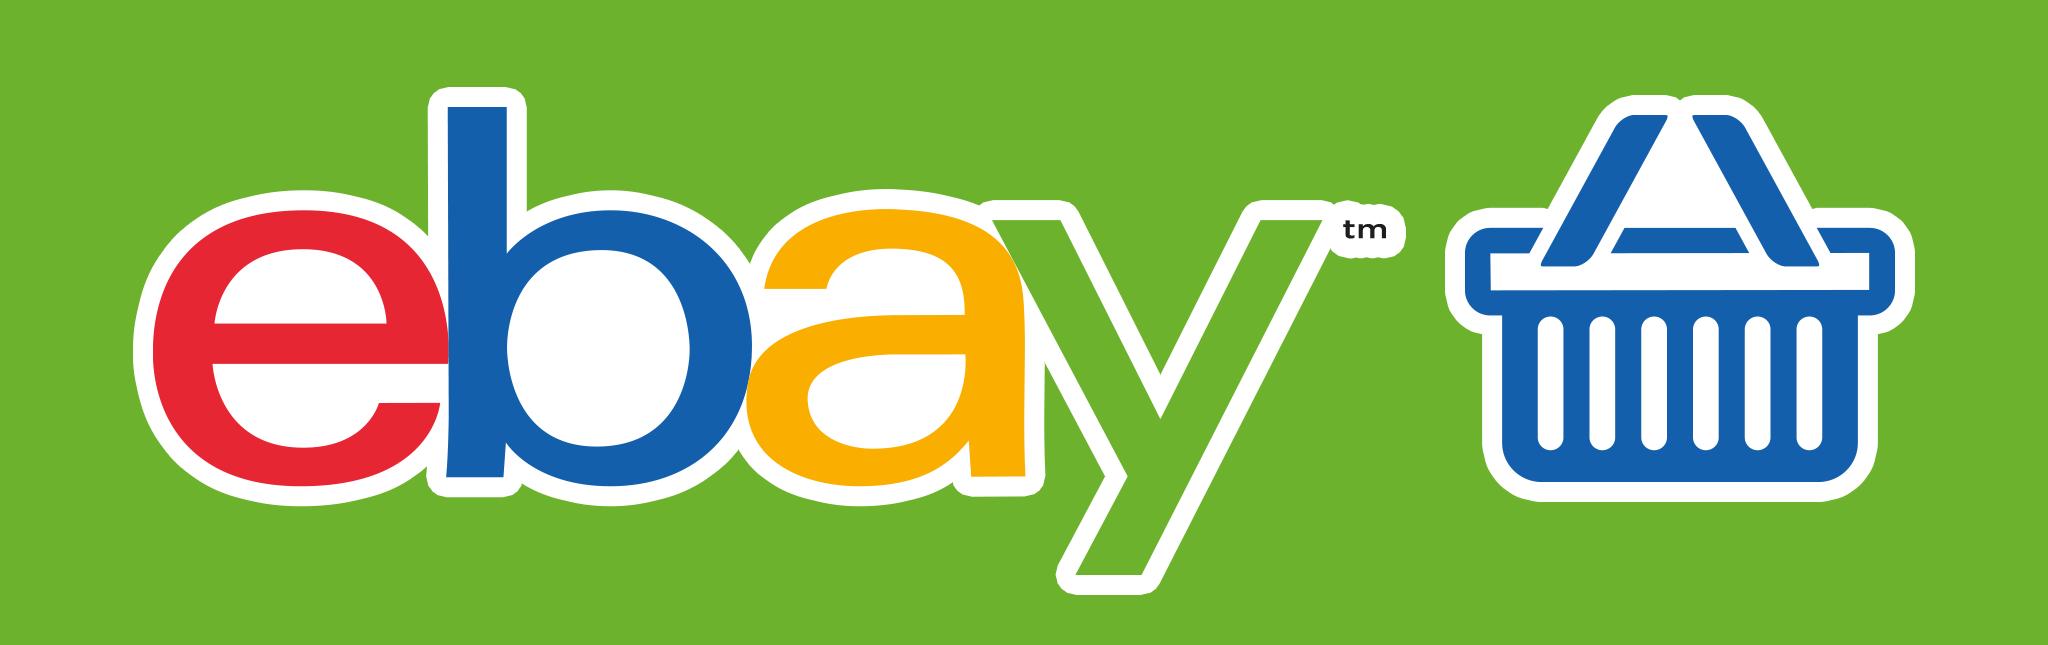 ebay-sothebys